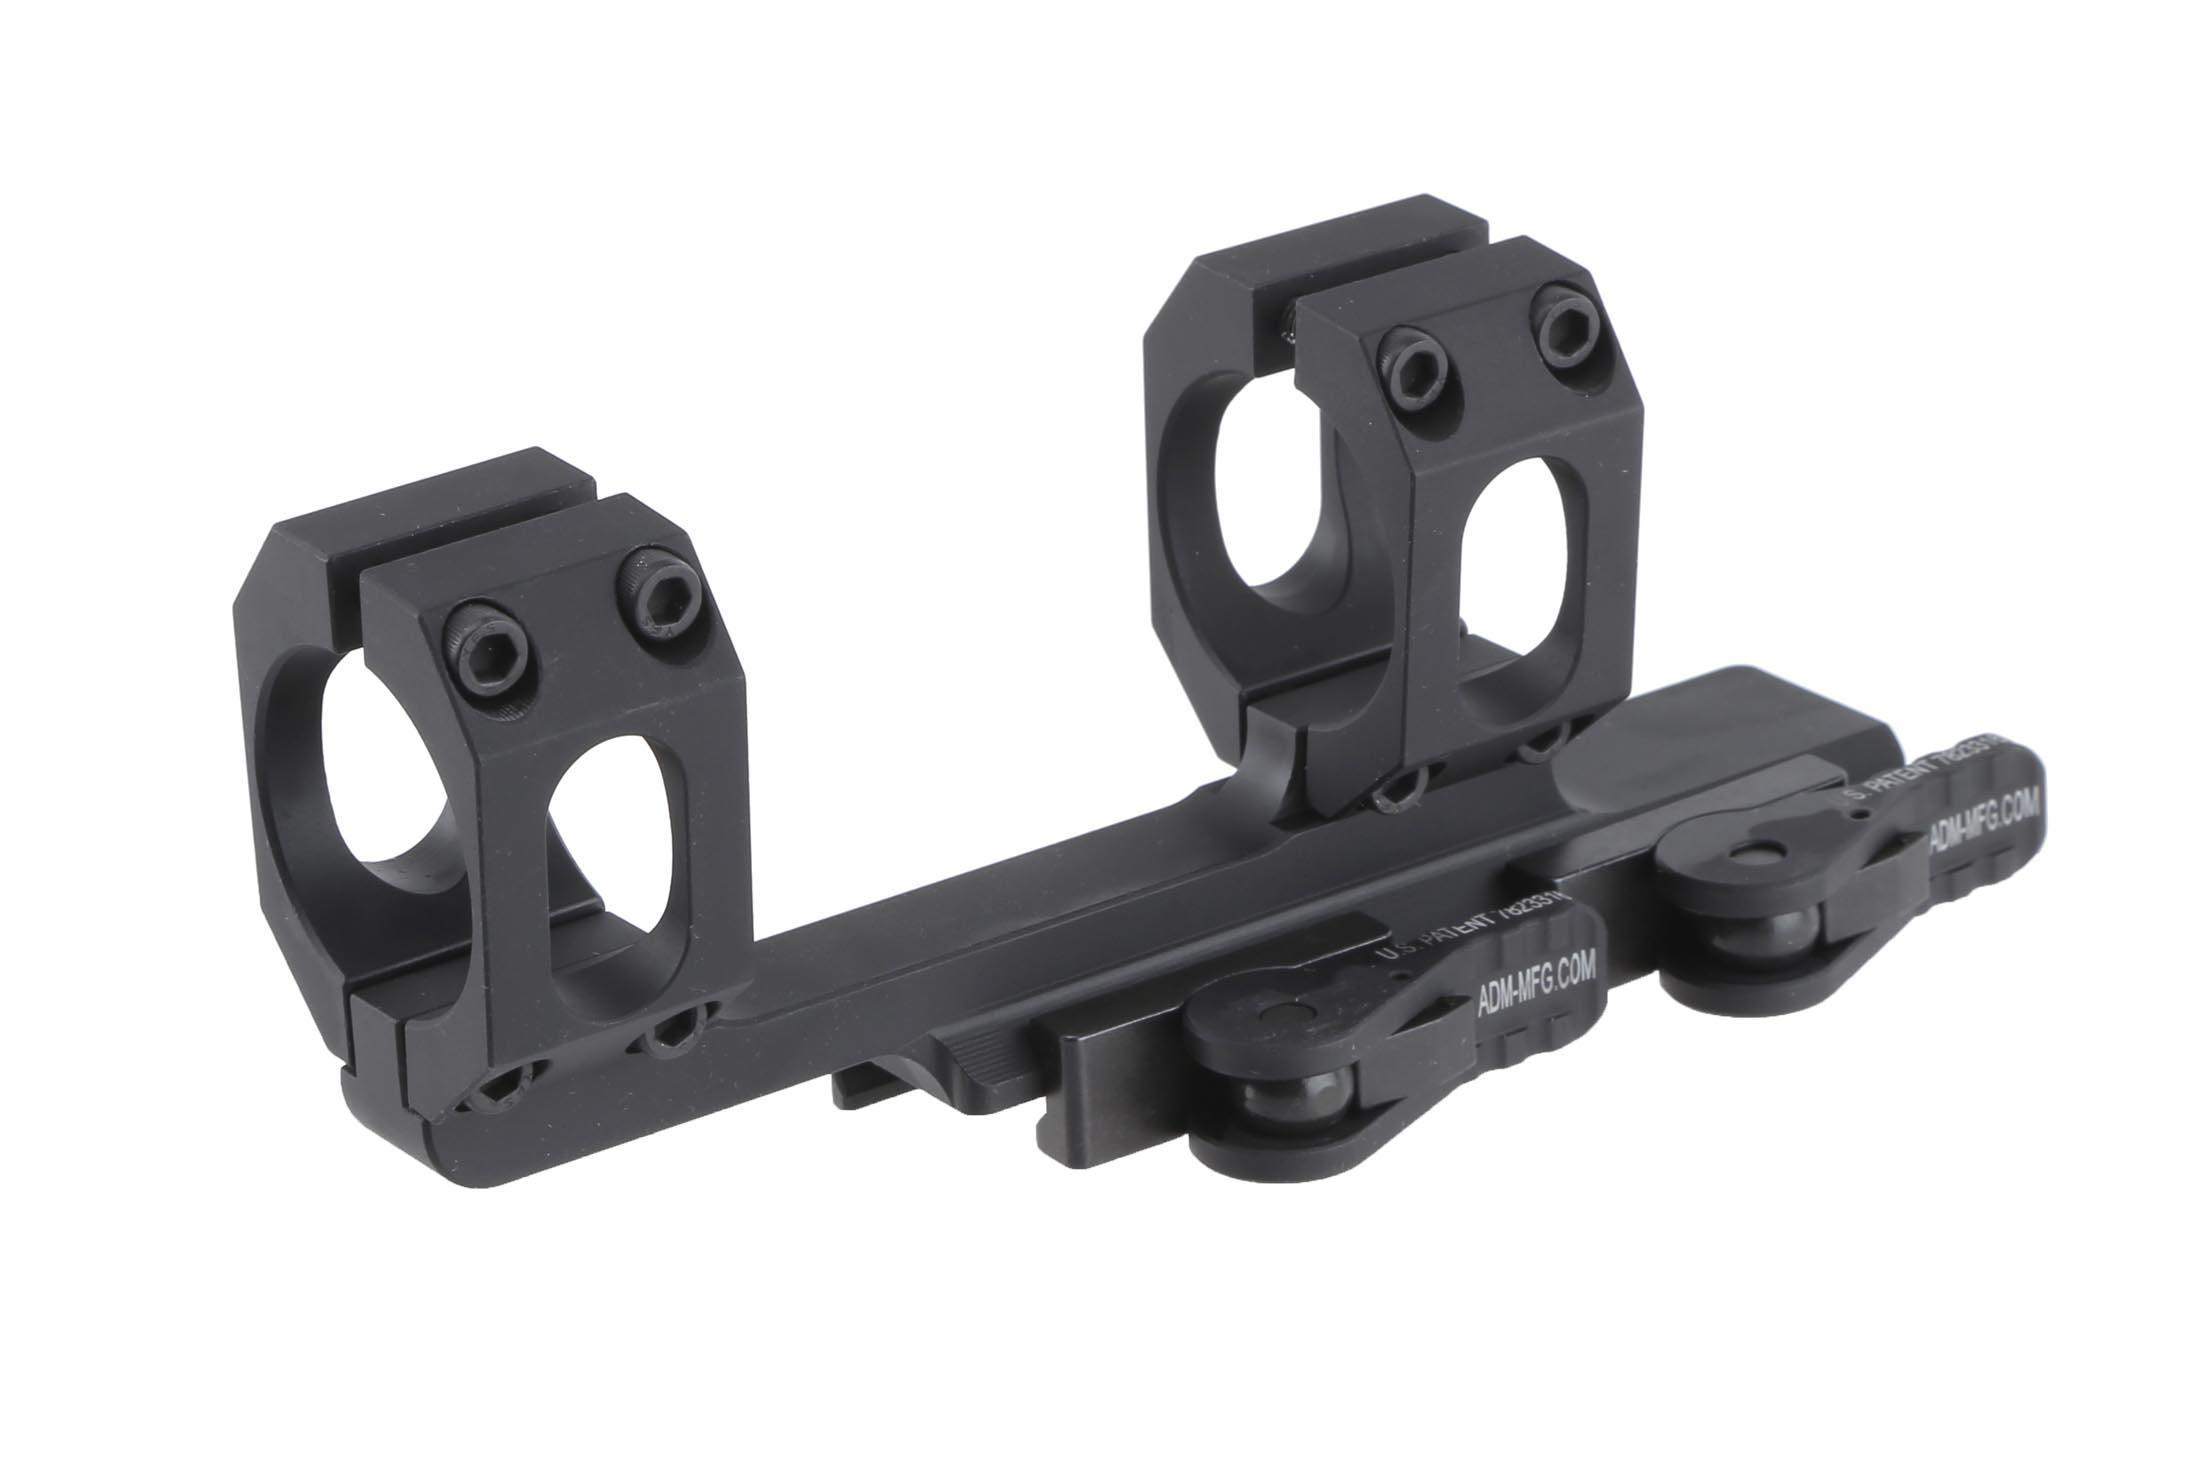 NEW LaRue Tactical Extend SPR-1.5 QD 30mm Scope Mount (LT-104)